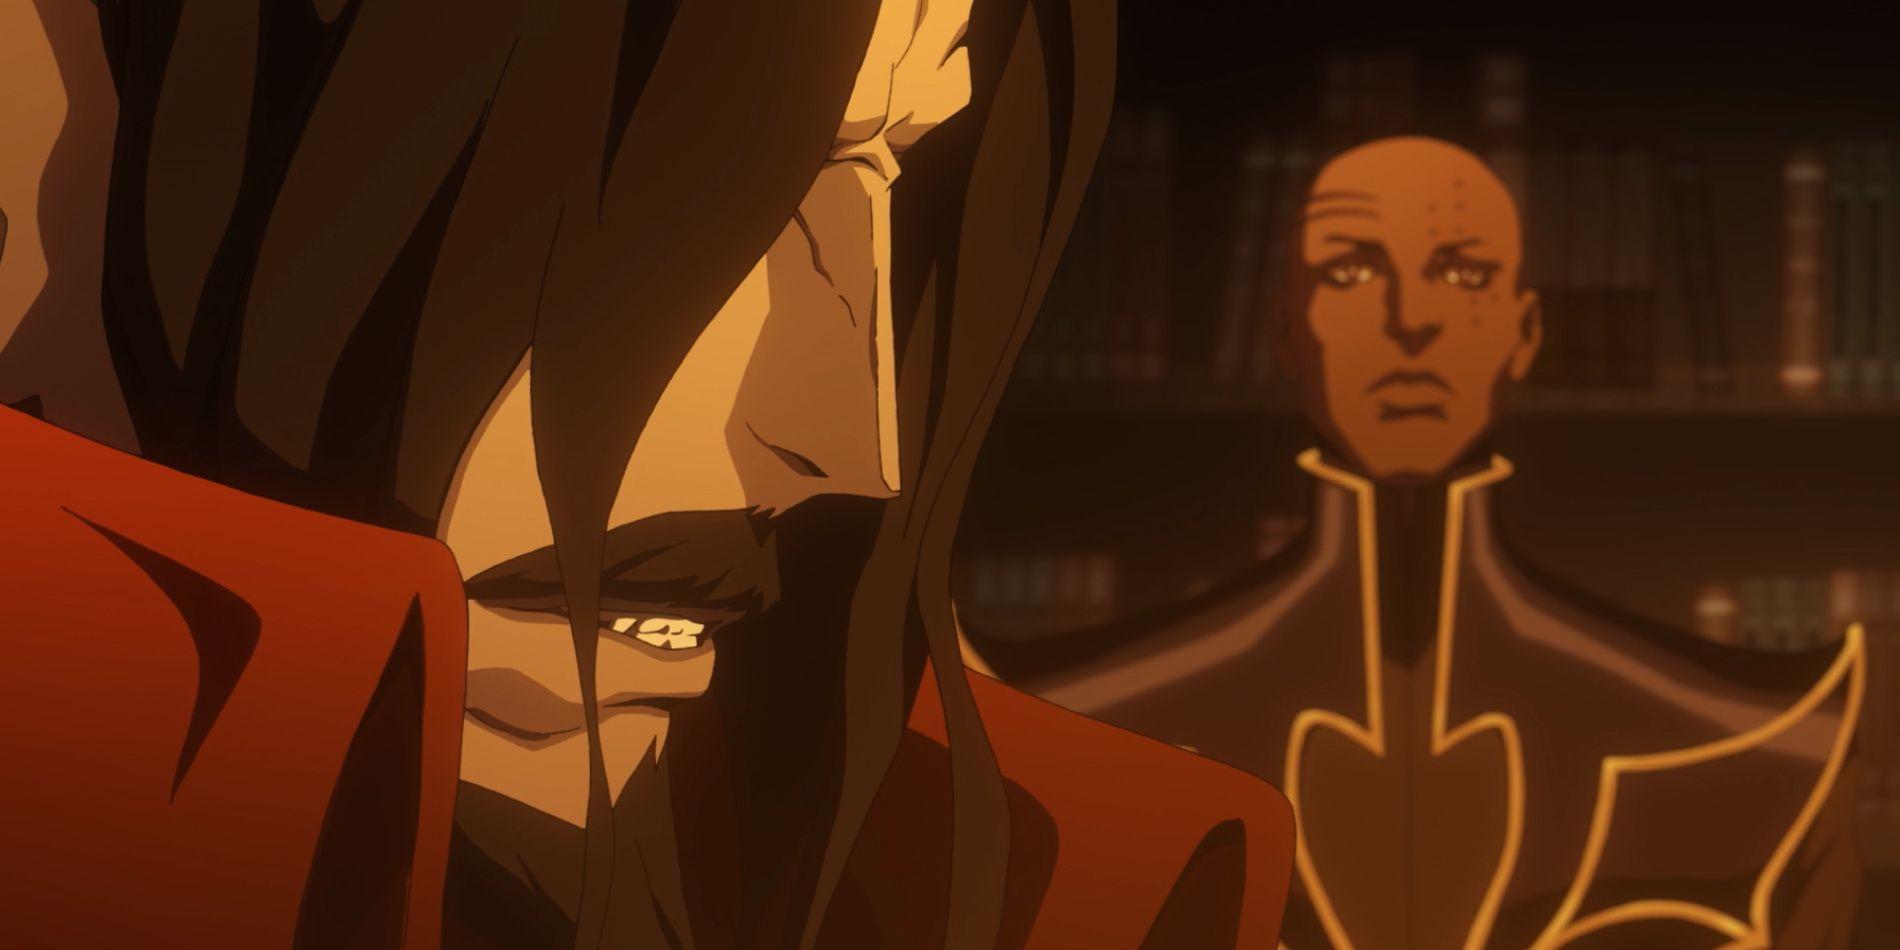 castlevania  isaac surpasses dracula u0026 39 s evil in season 2